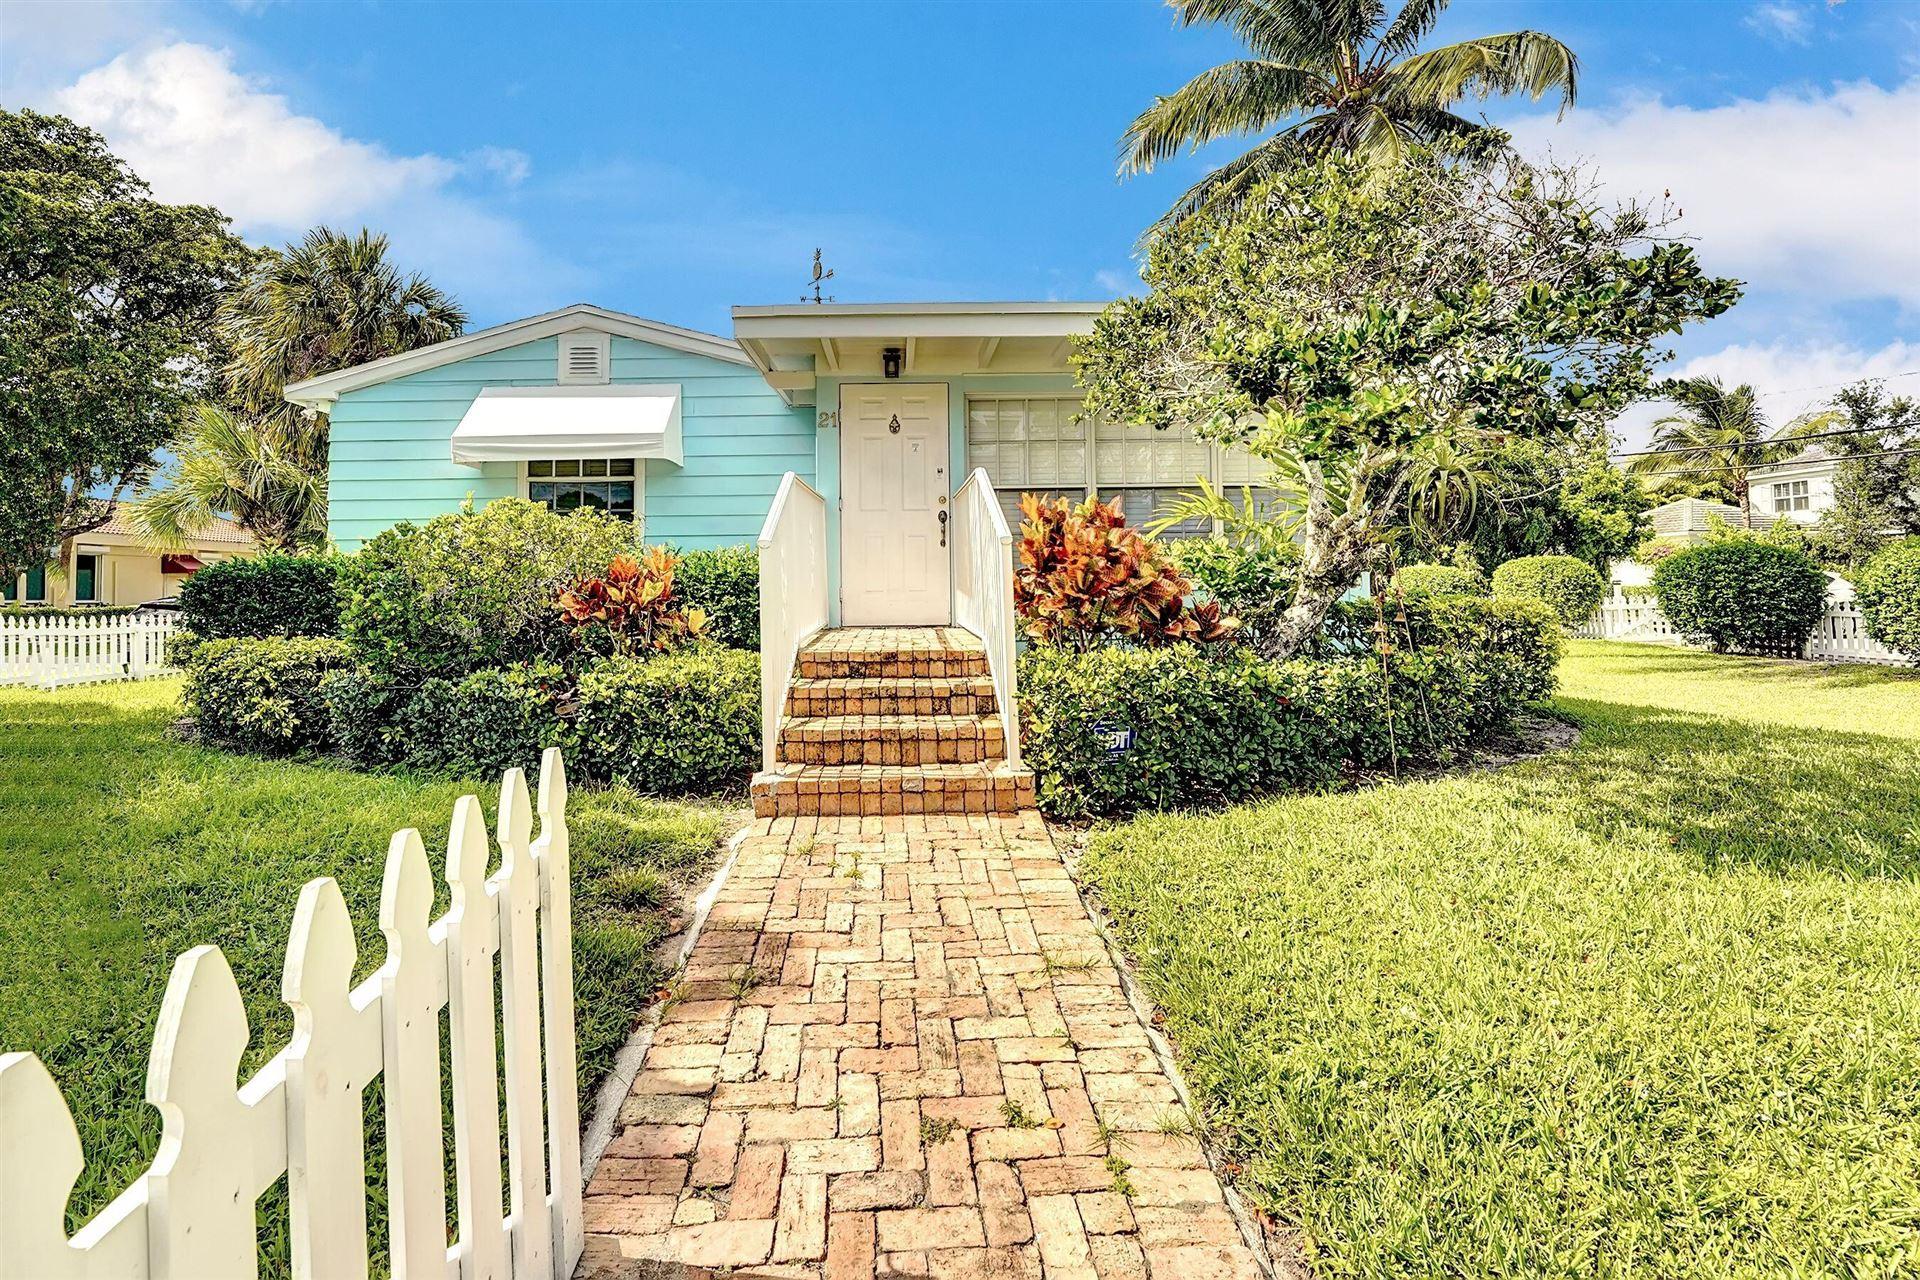 21 NW 2nd Street, Delray Beach, FL 33444 - MLS#: RX-10721725